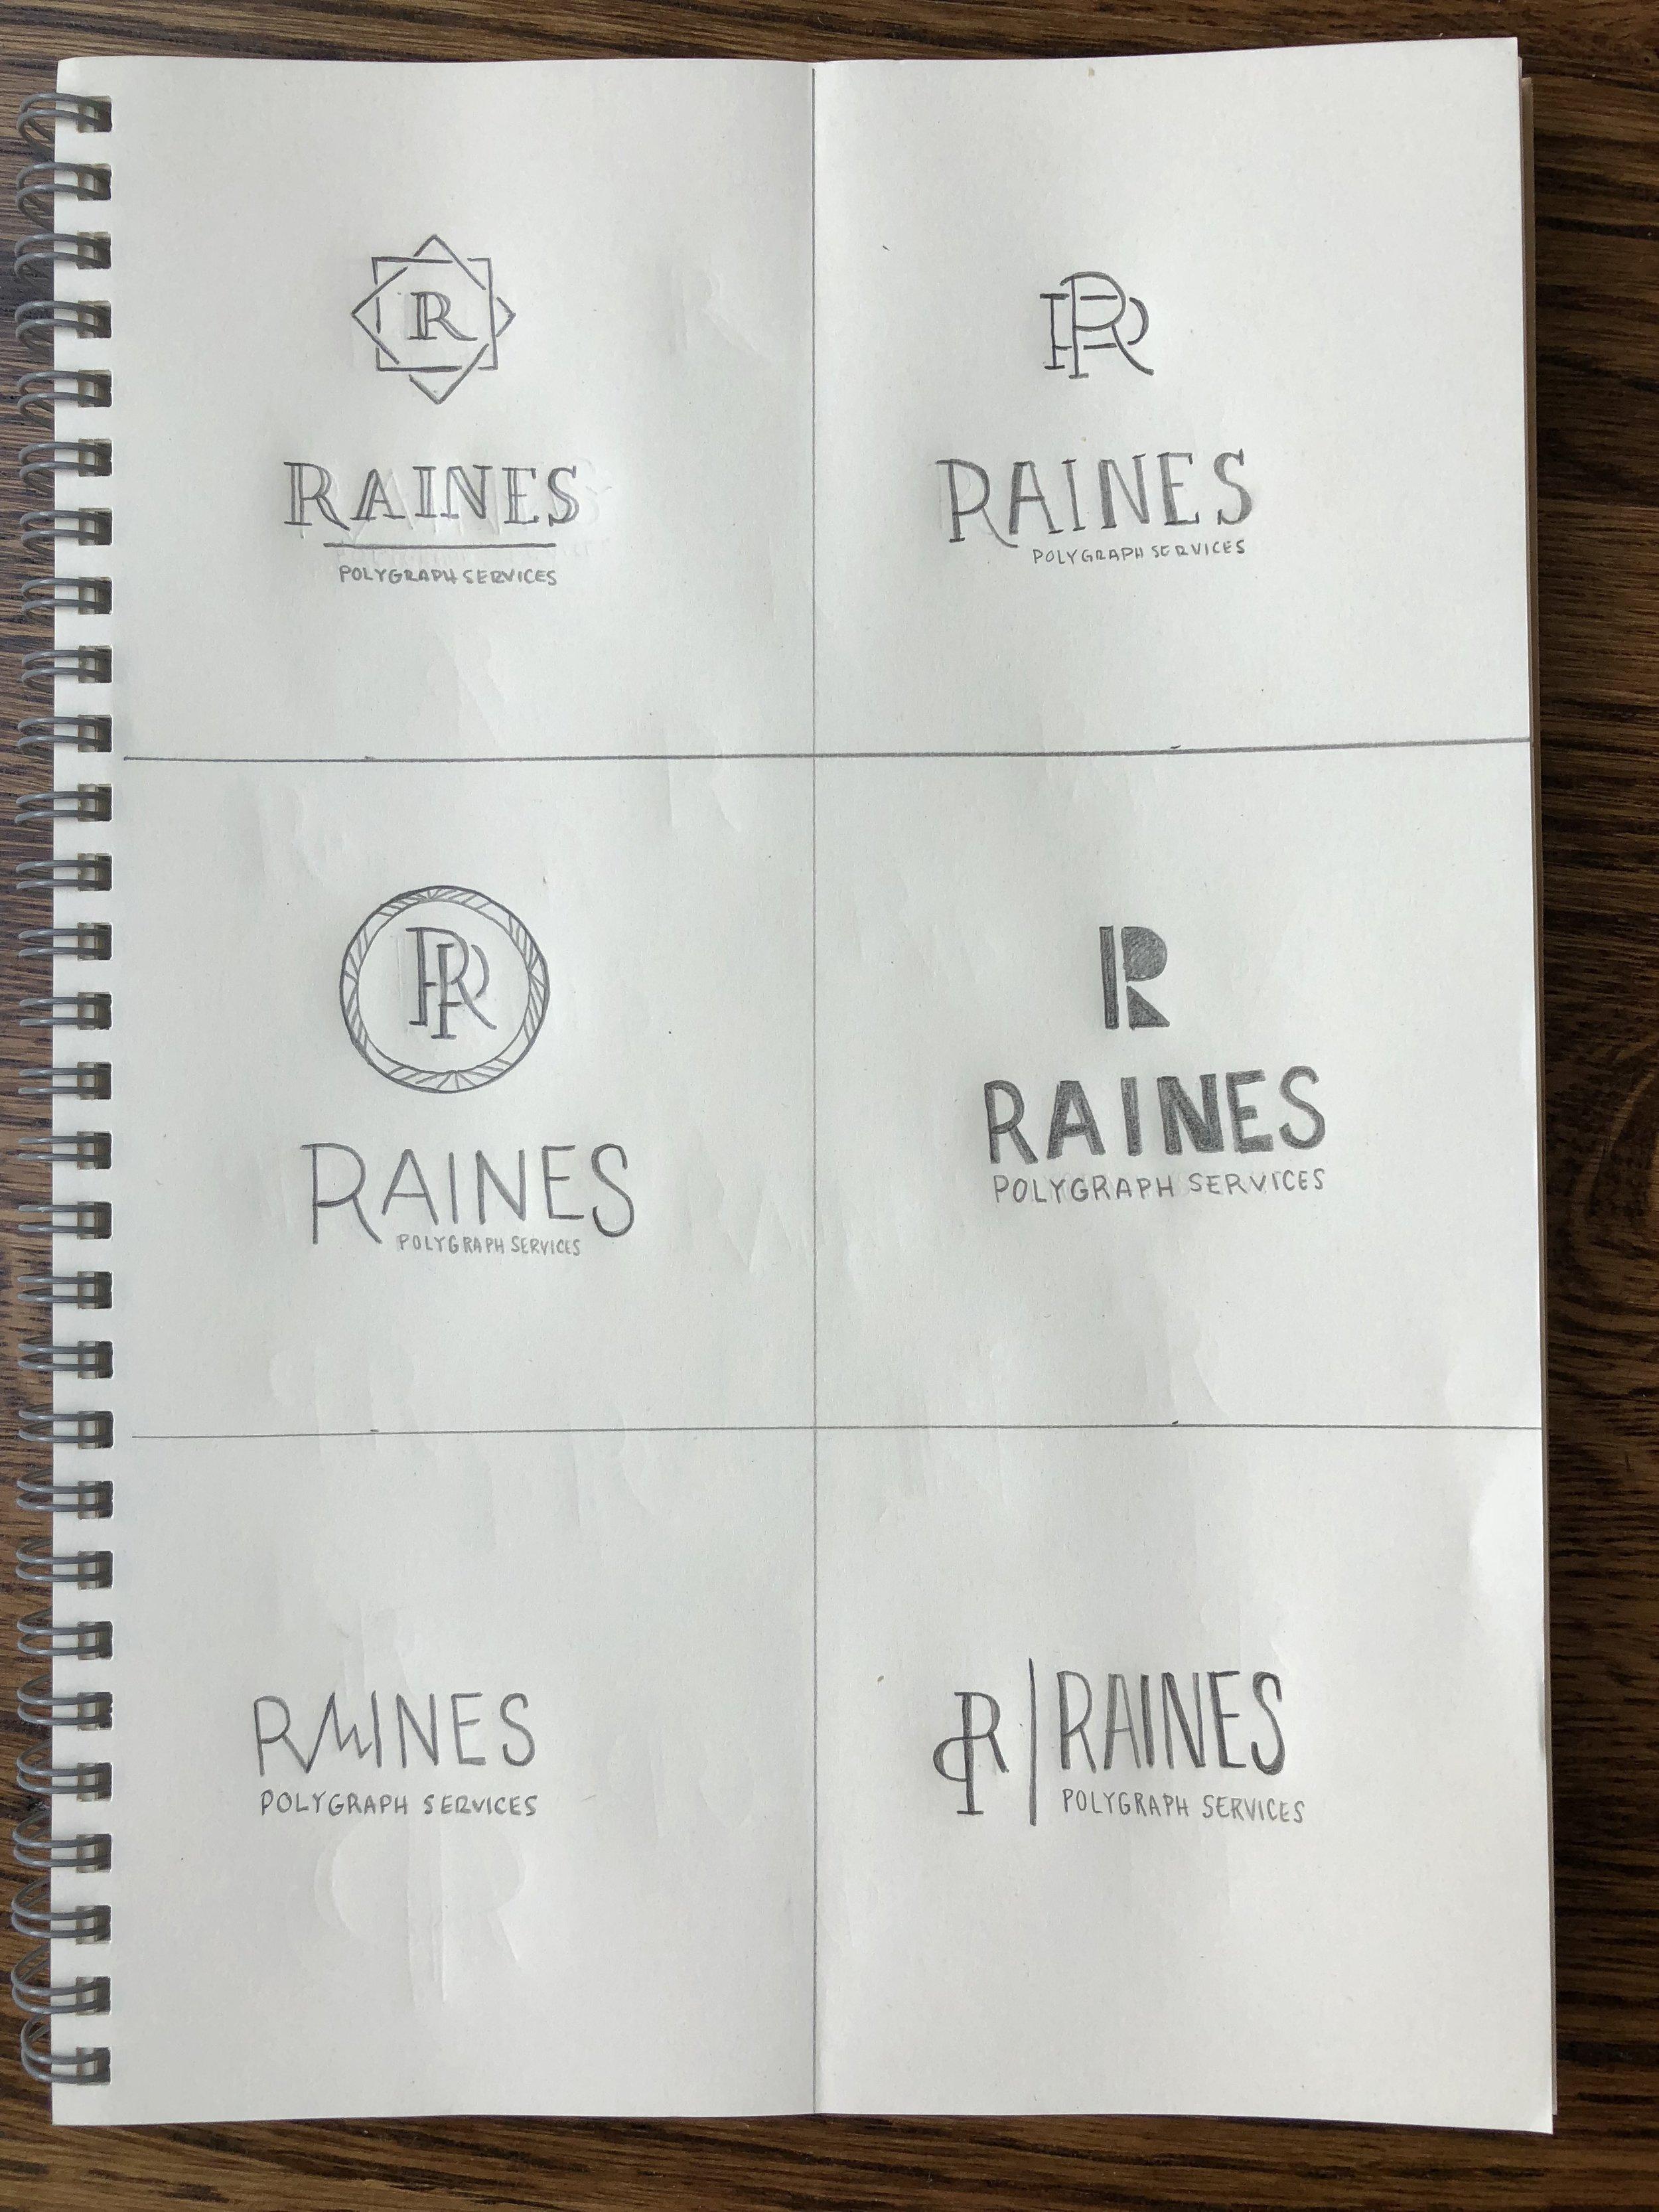 Raines Polygraph Services - Hayley Bigham Designs - tulsa brand designer - logo sketches